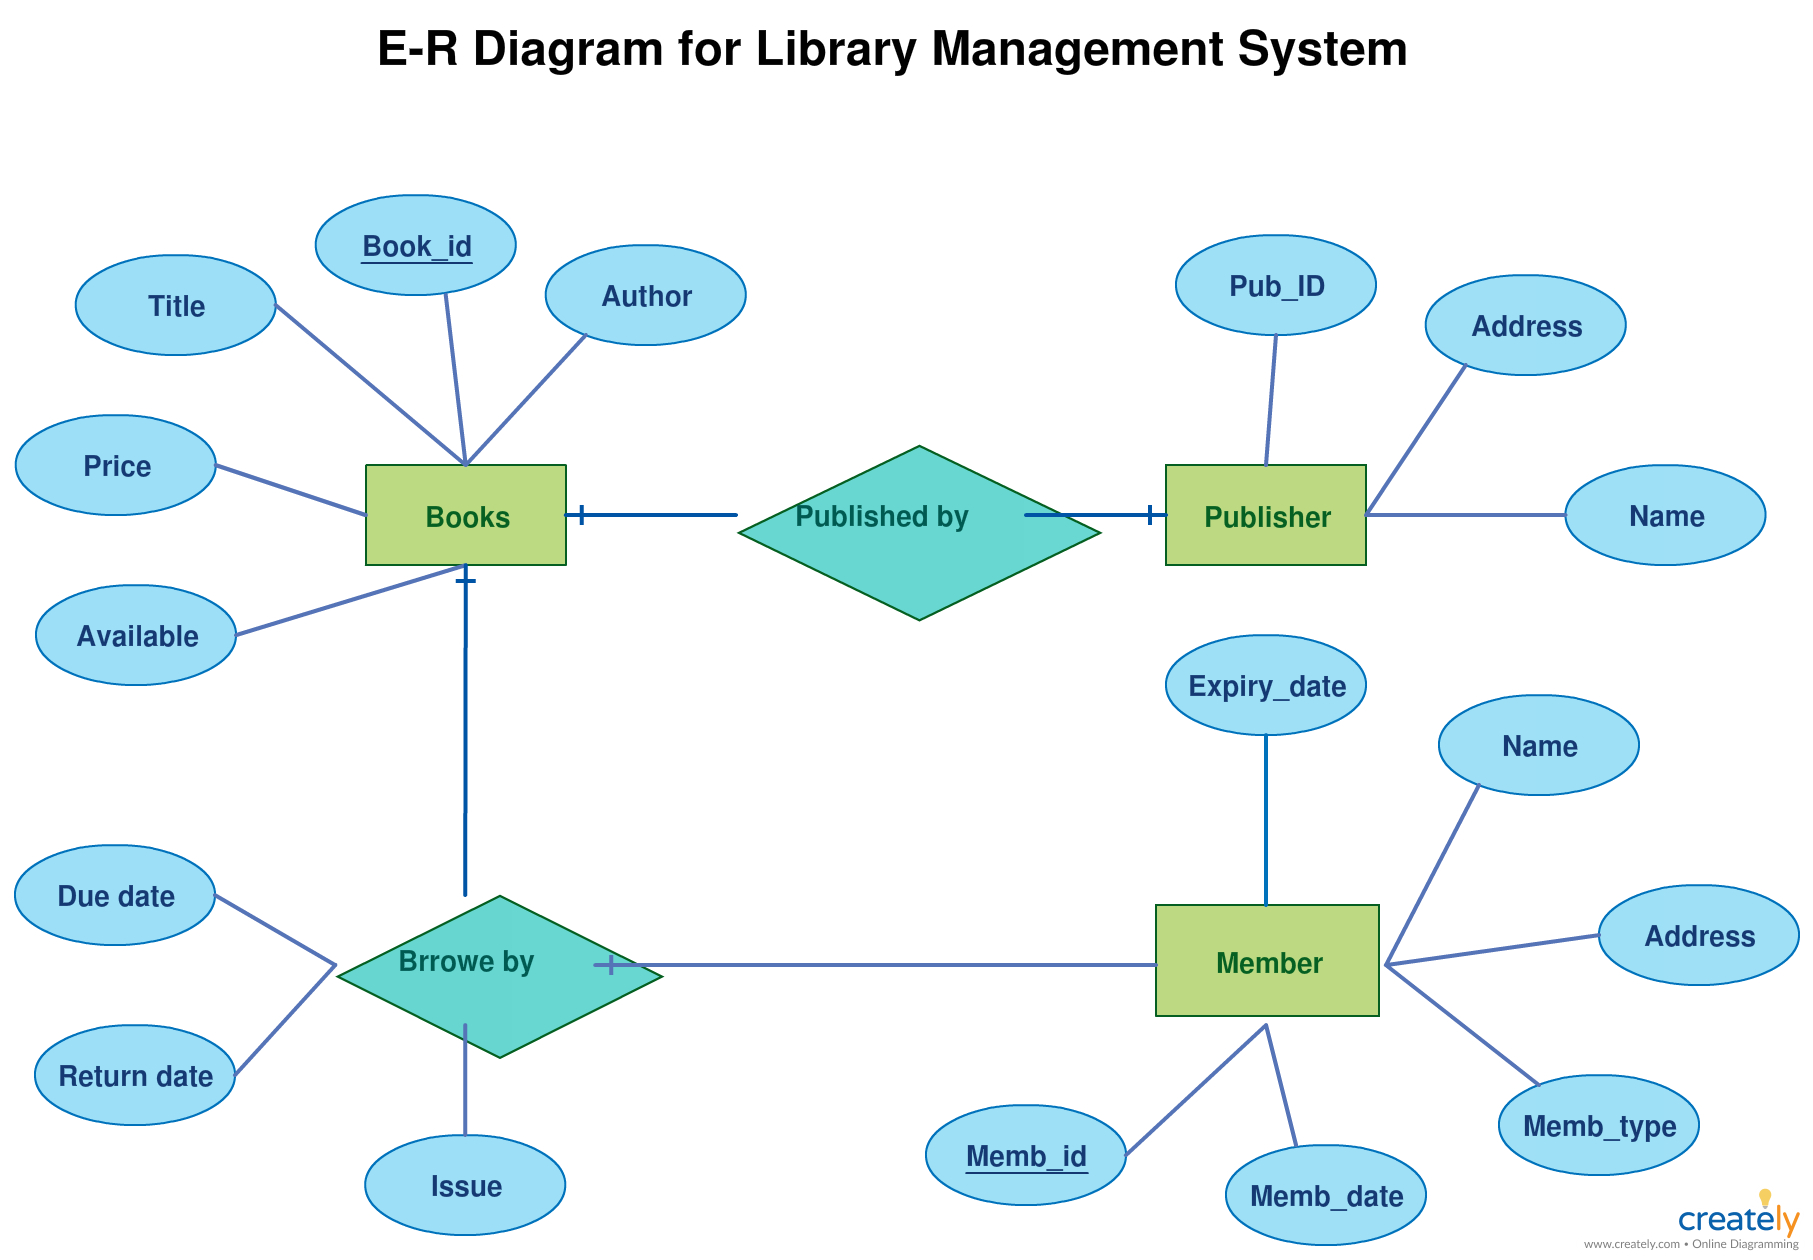 Er Diagram Tutorial | Data Flow Diagram, Diagram, Class Diagram regarding How To Draw Erd Diagram